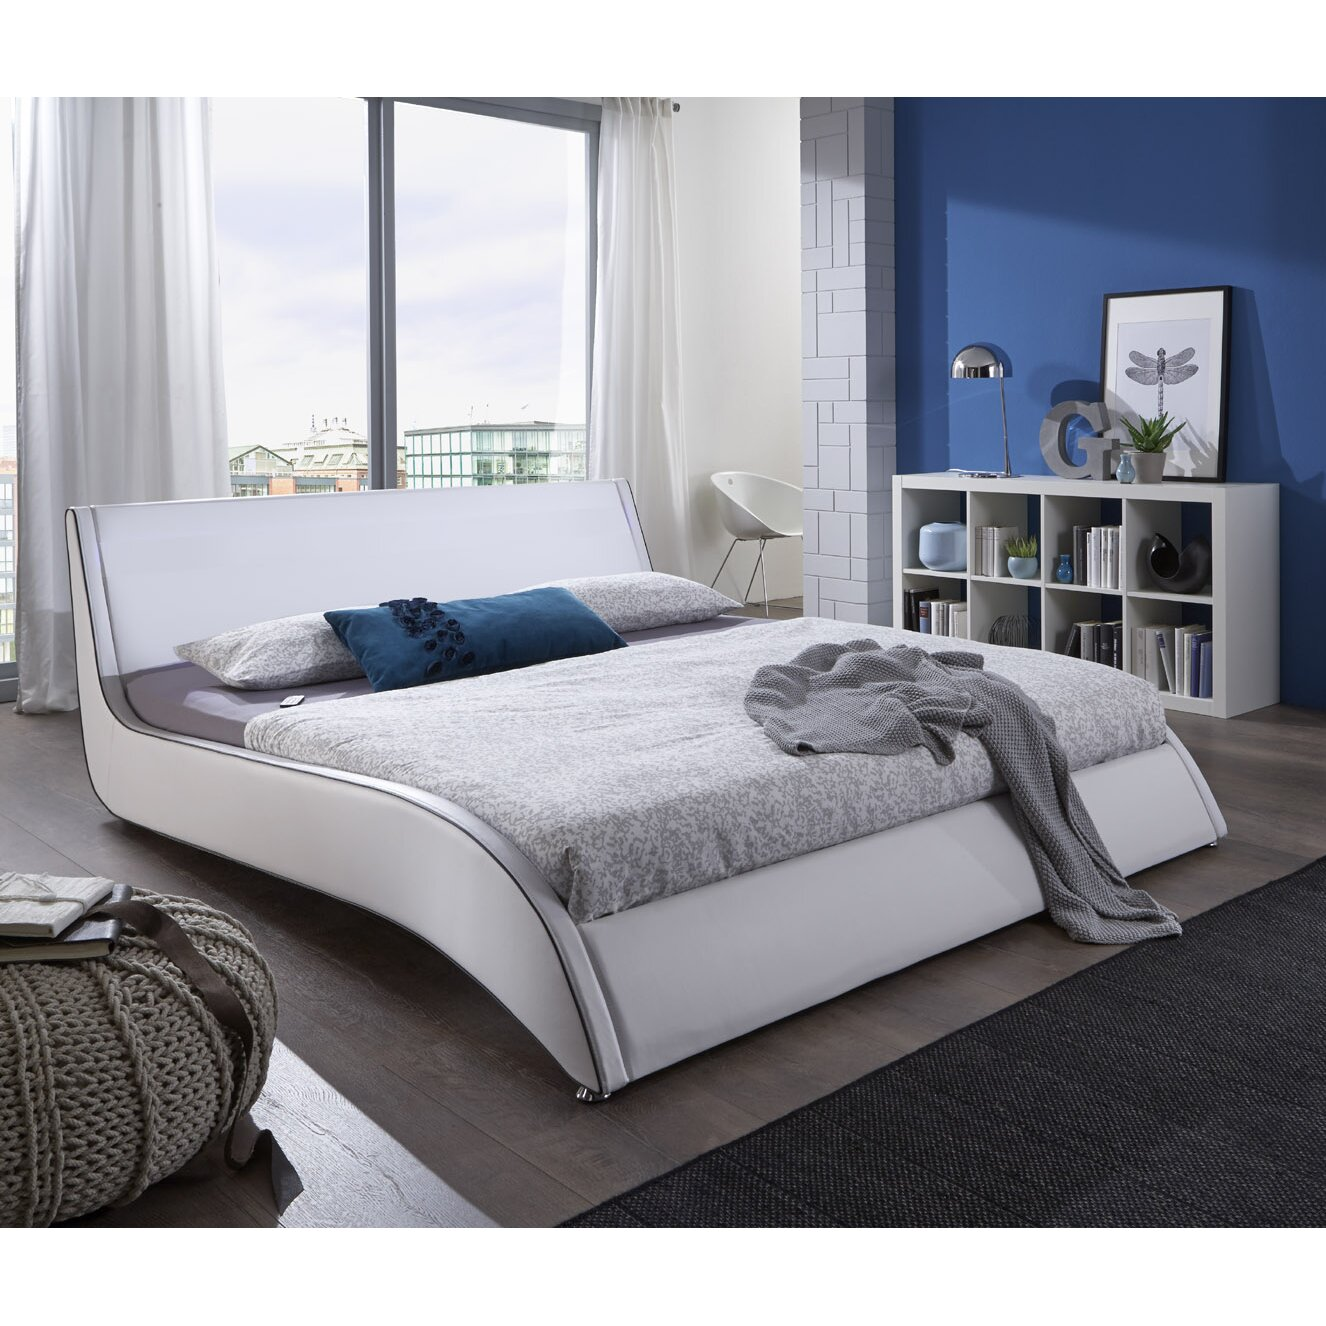 sam stil art m bel gmbh polsterbett sun. Black Bedroom Furniture Sets. Home Design Ideas